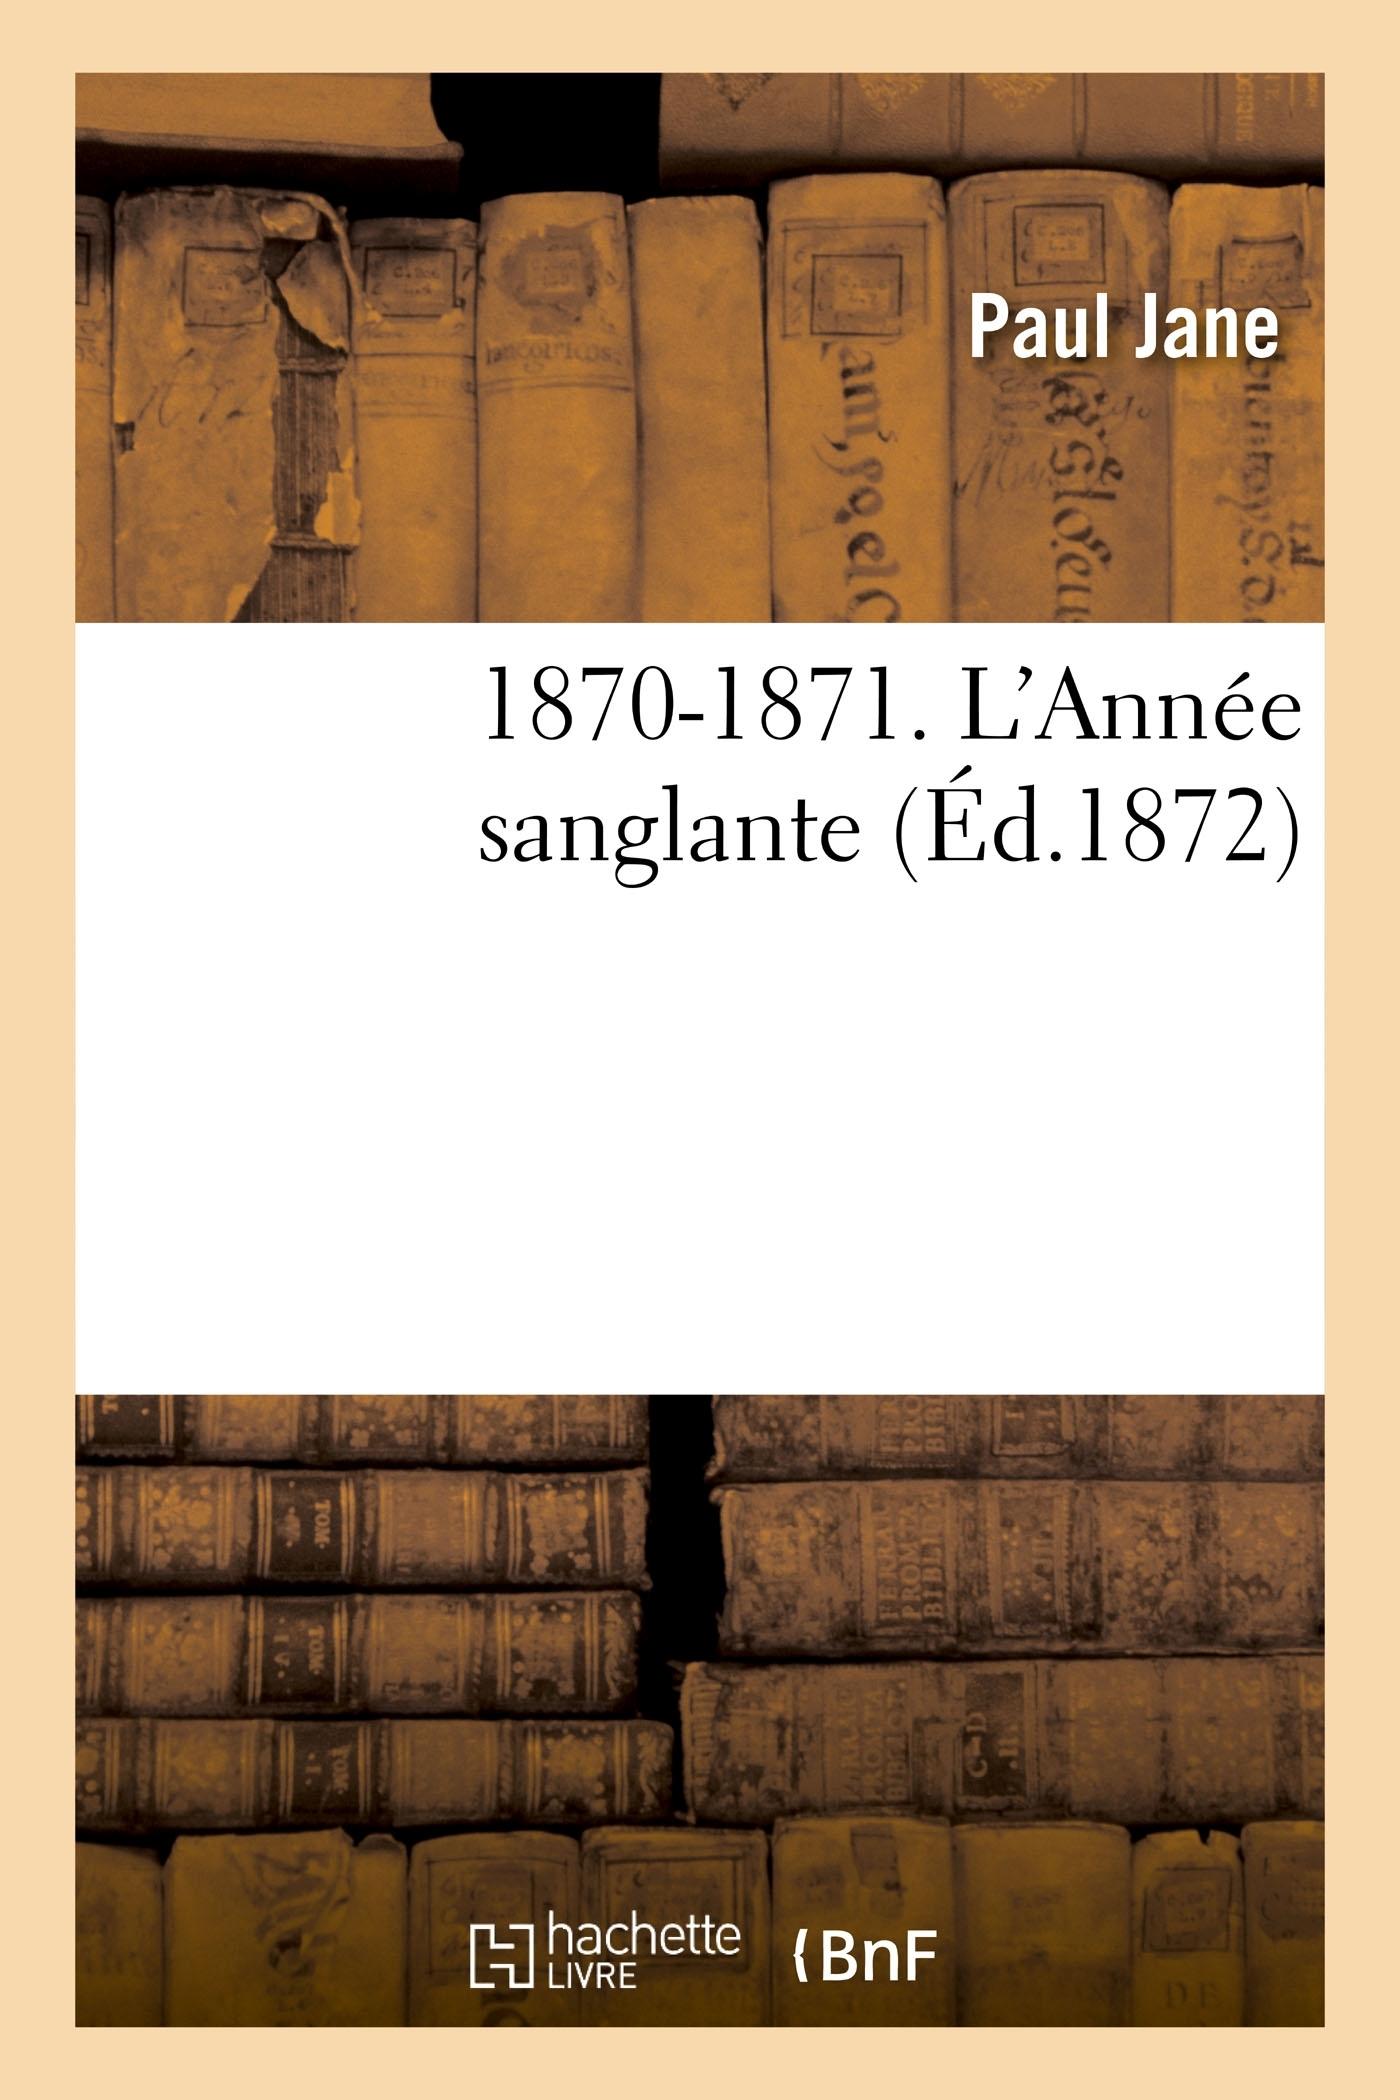 1870-1871. L'ANNEE SANGLANTE